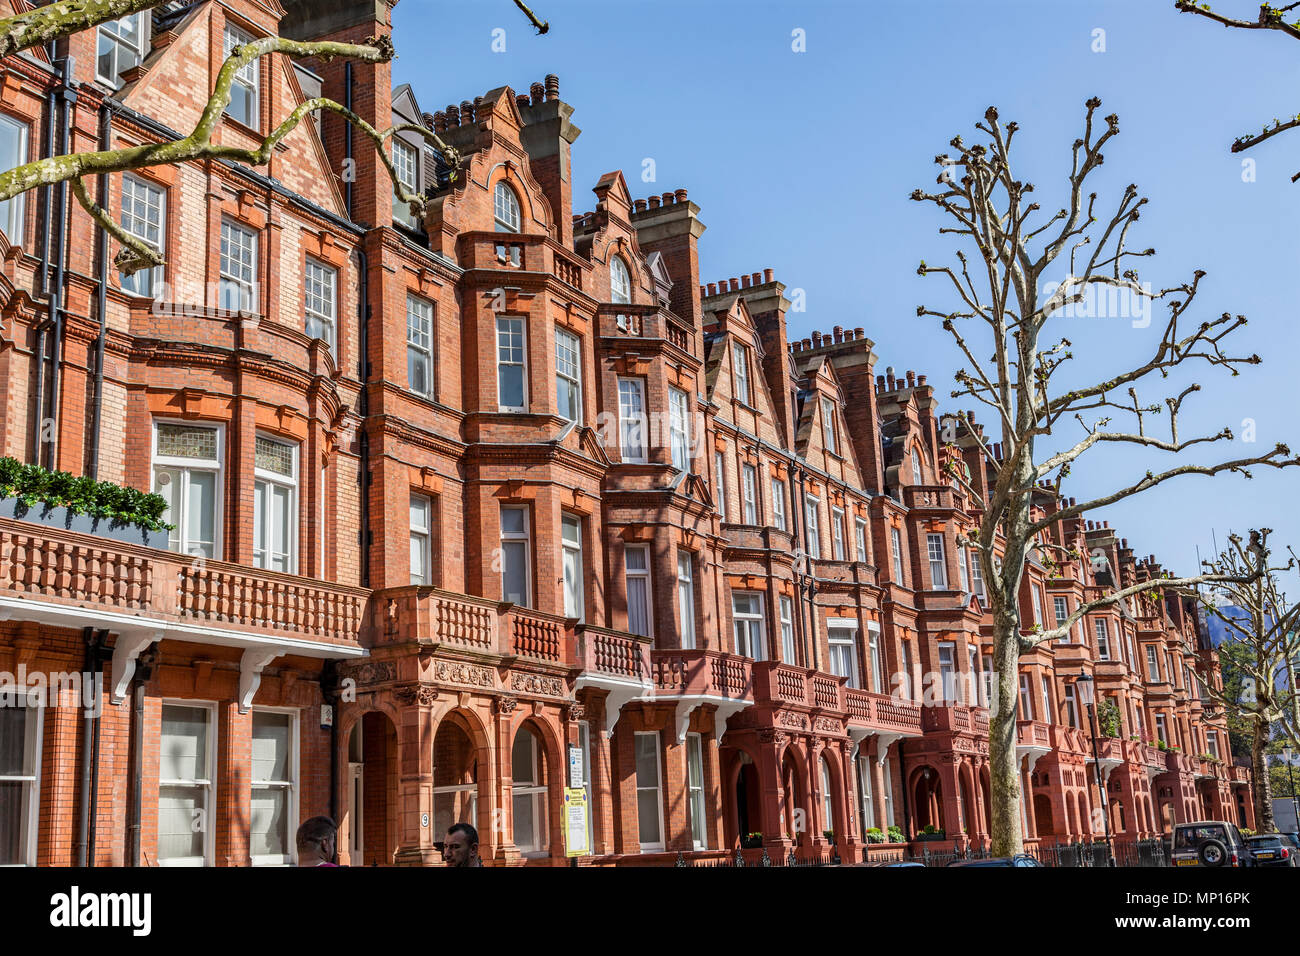 Sloane Gardens, exclusive area of London SW1W - Stock Image